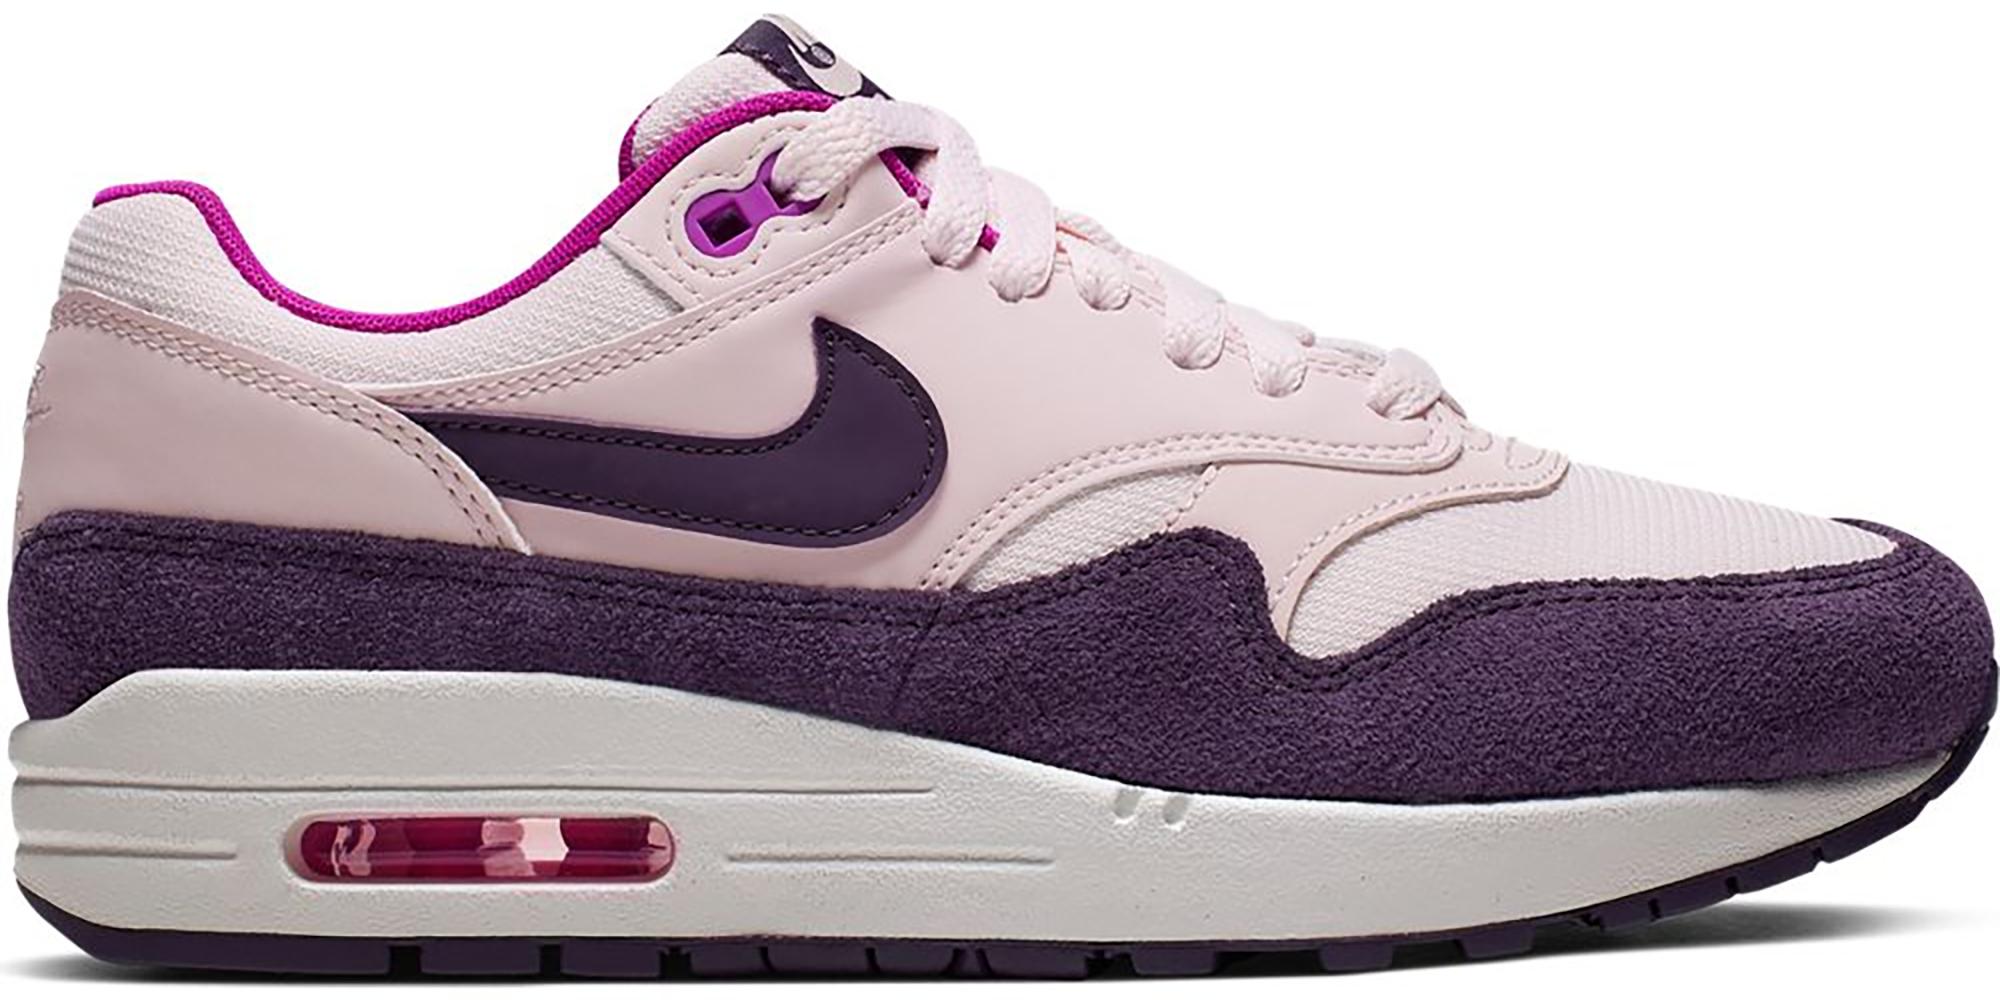 Nike Air Max 1 Light Soft Pink Grand